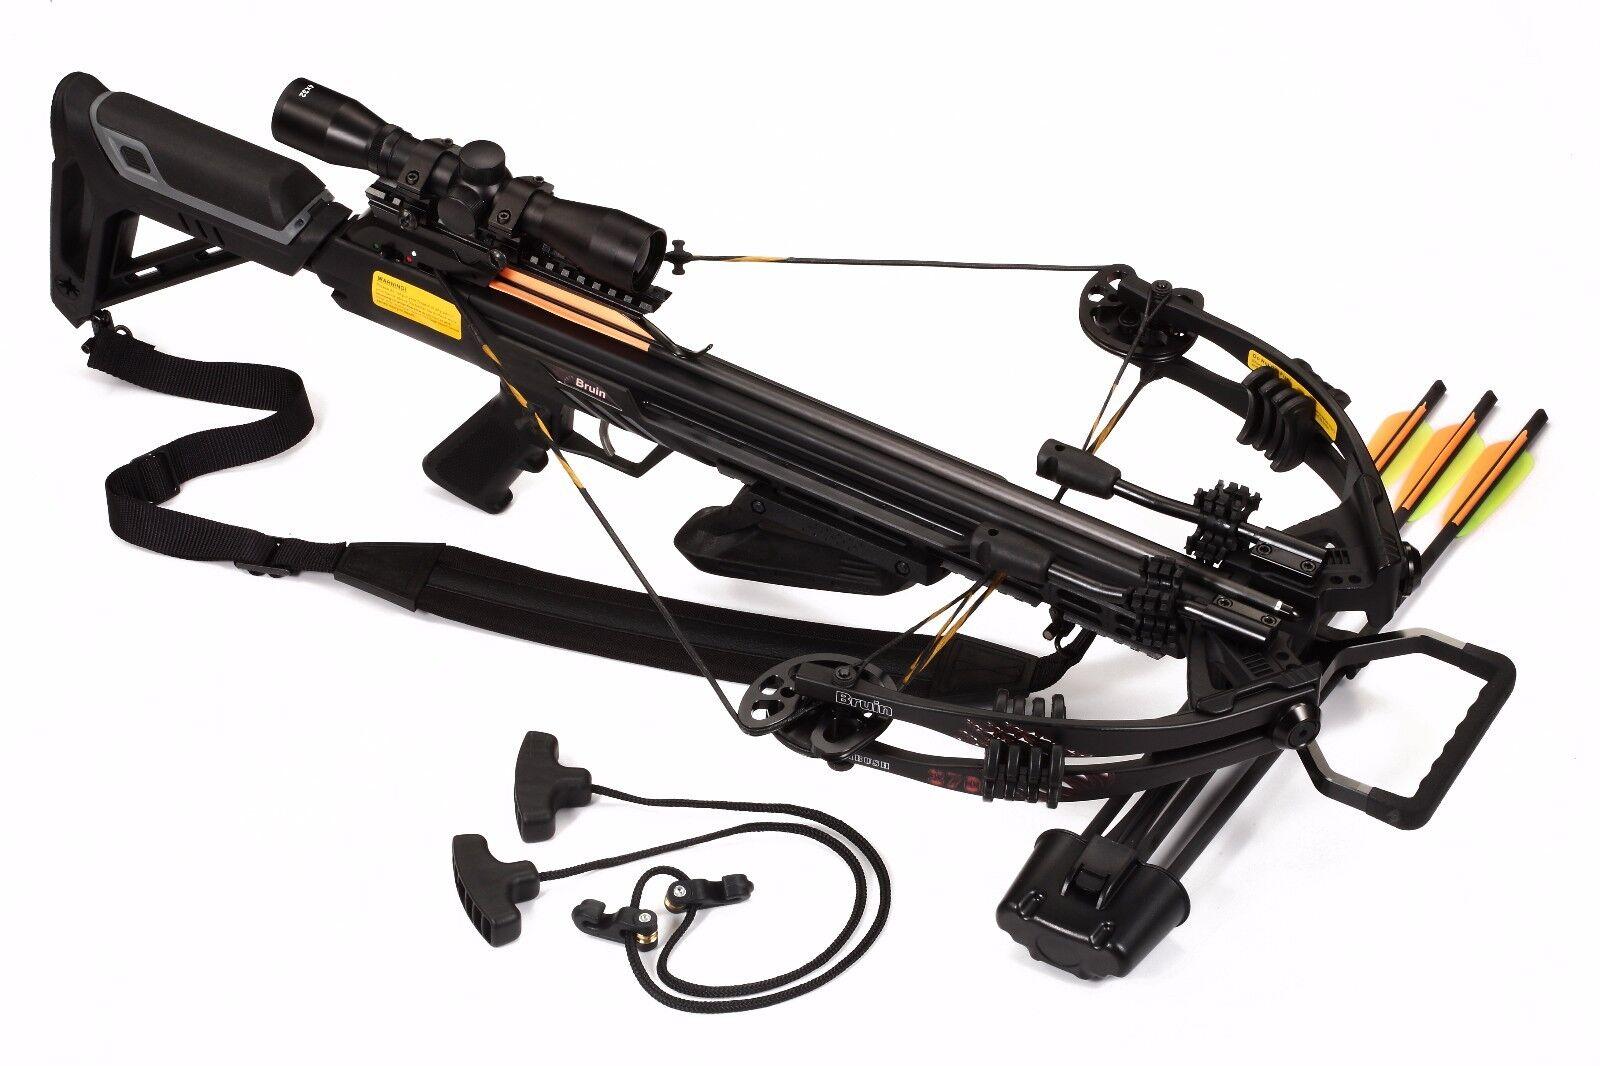 Bruin Ambush 370 Ready To Hunt Crossbow Package w/ 3x32 Illuminated Scope